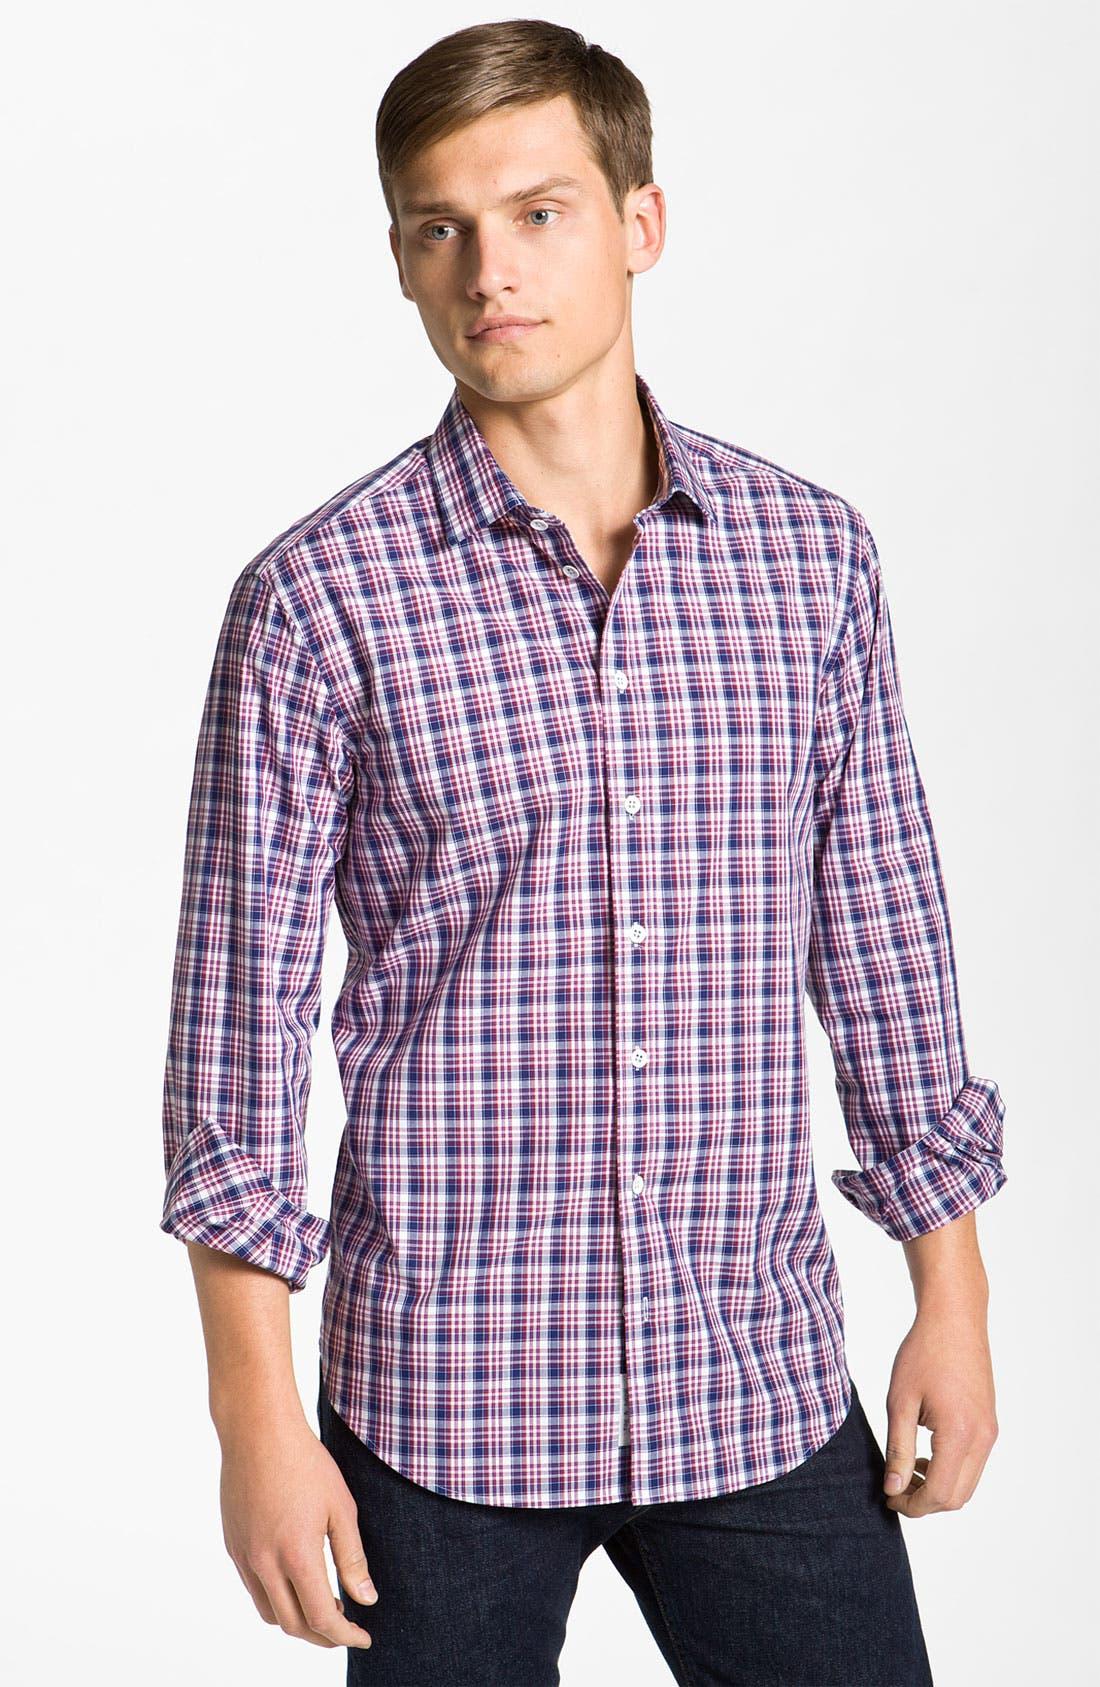 Alternate Image 1 Selected - rag & bone 'Charles' Plaid Woven Shirt